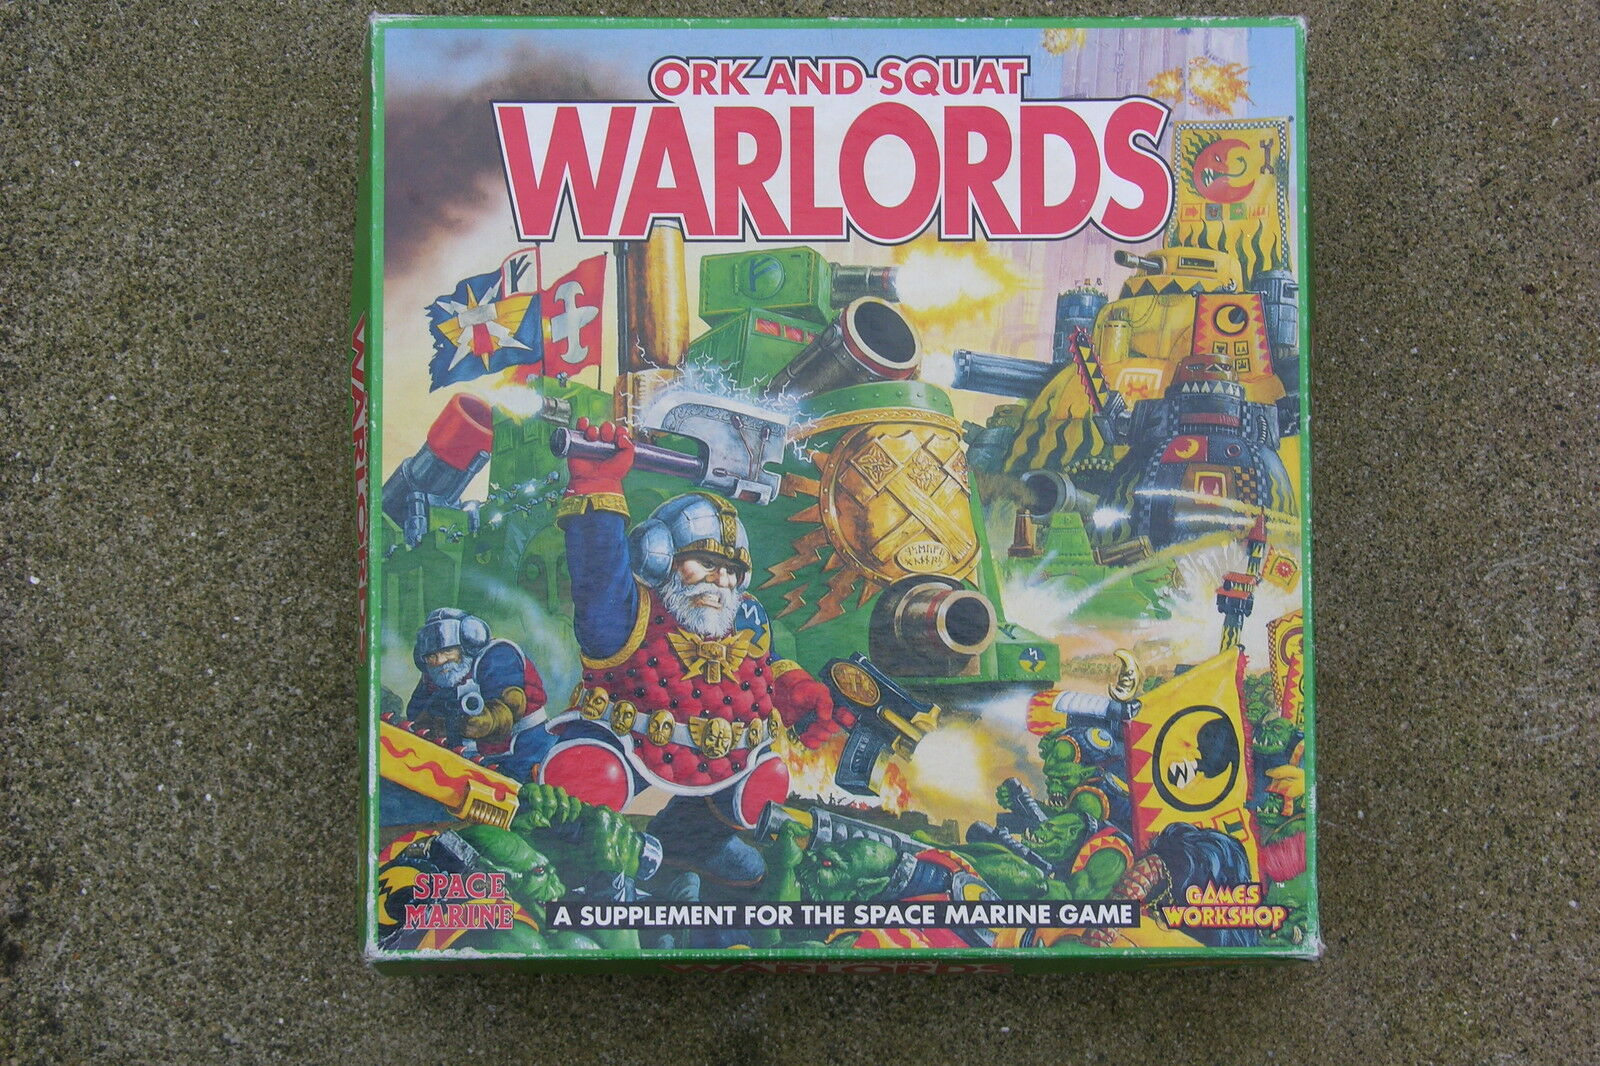 GAMES WORKSHOP,SPACE MARINE GAME,ORK AND SQUAT WARLORDS, BNIB, SEALED